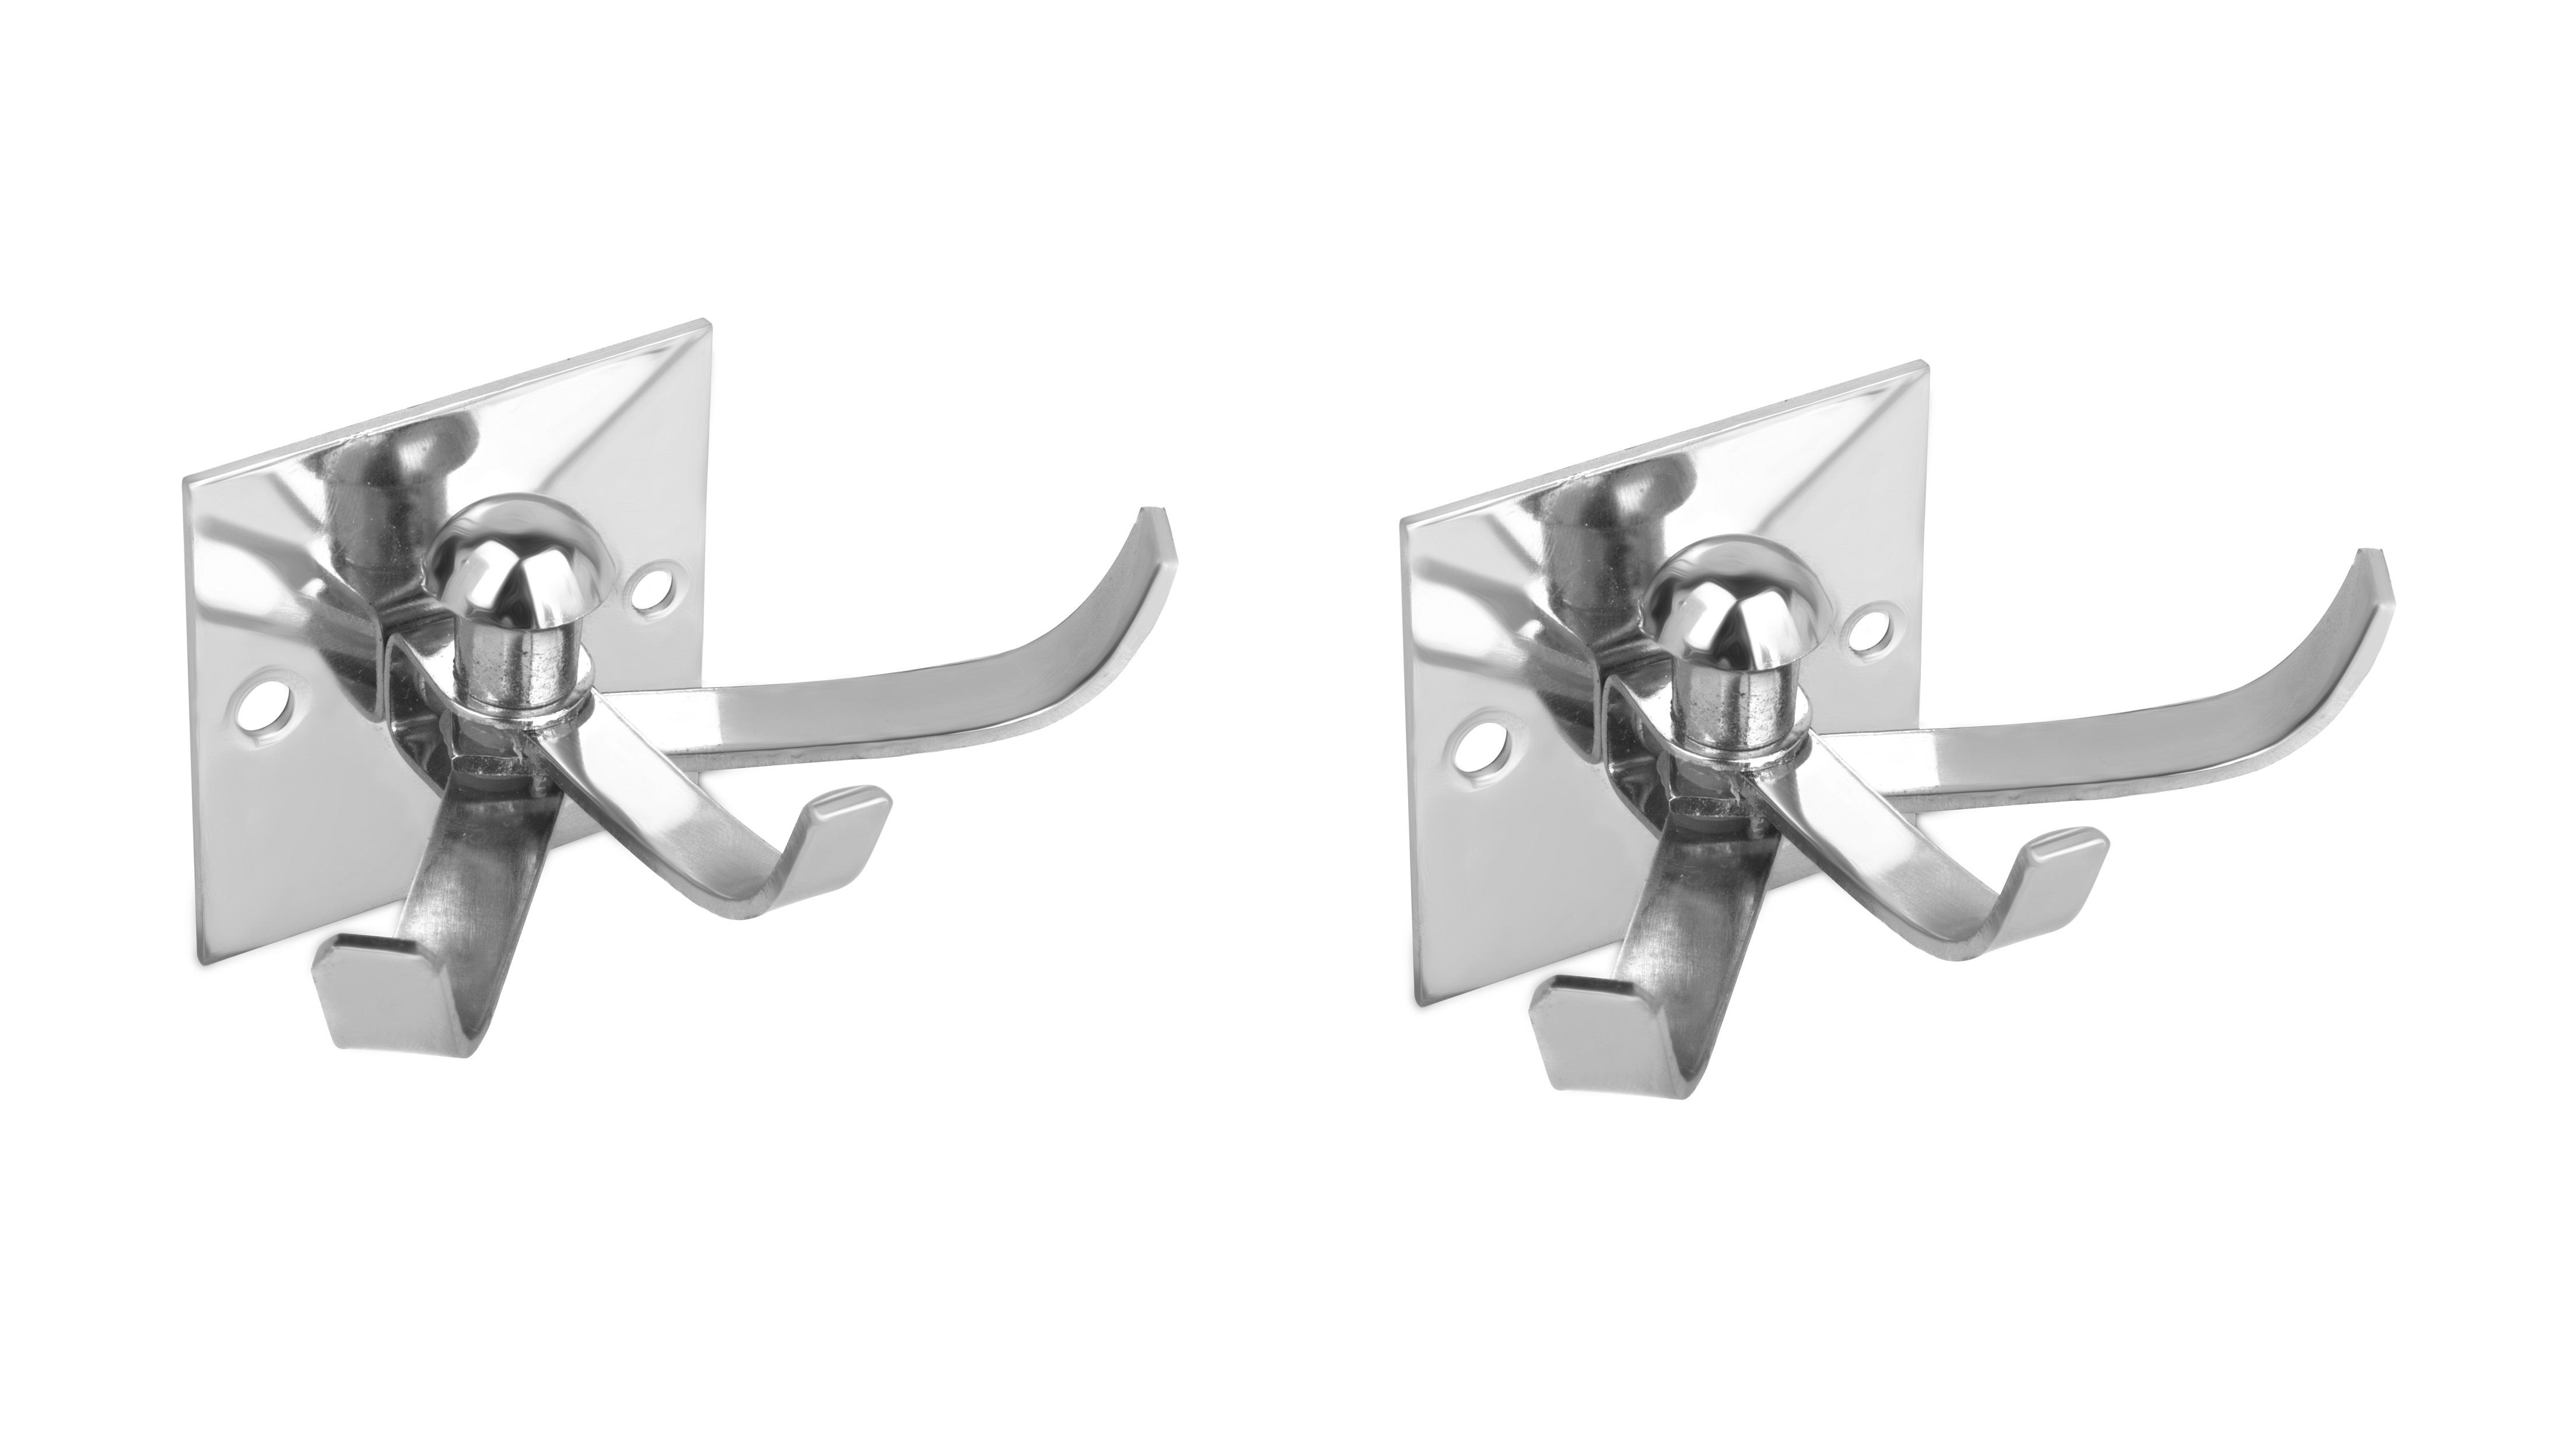 Kurvz Square Shape Flexible 4 Pin Cloth Hanger Bathroom Wall Door Hooks For Hanging keys,Clothes,towel  Pack of 2